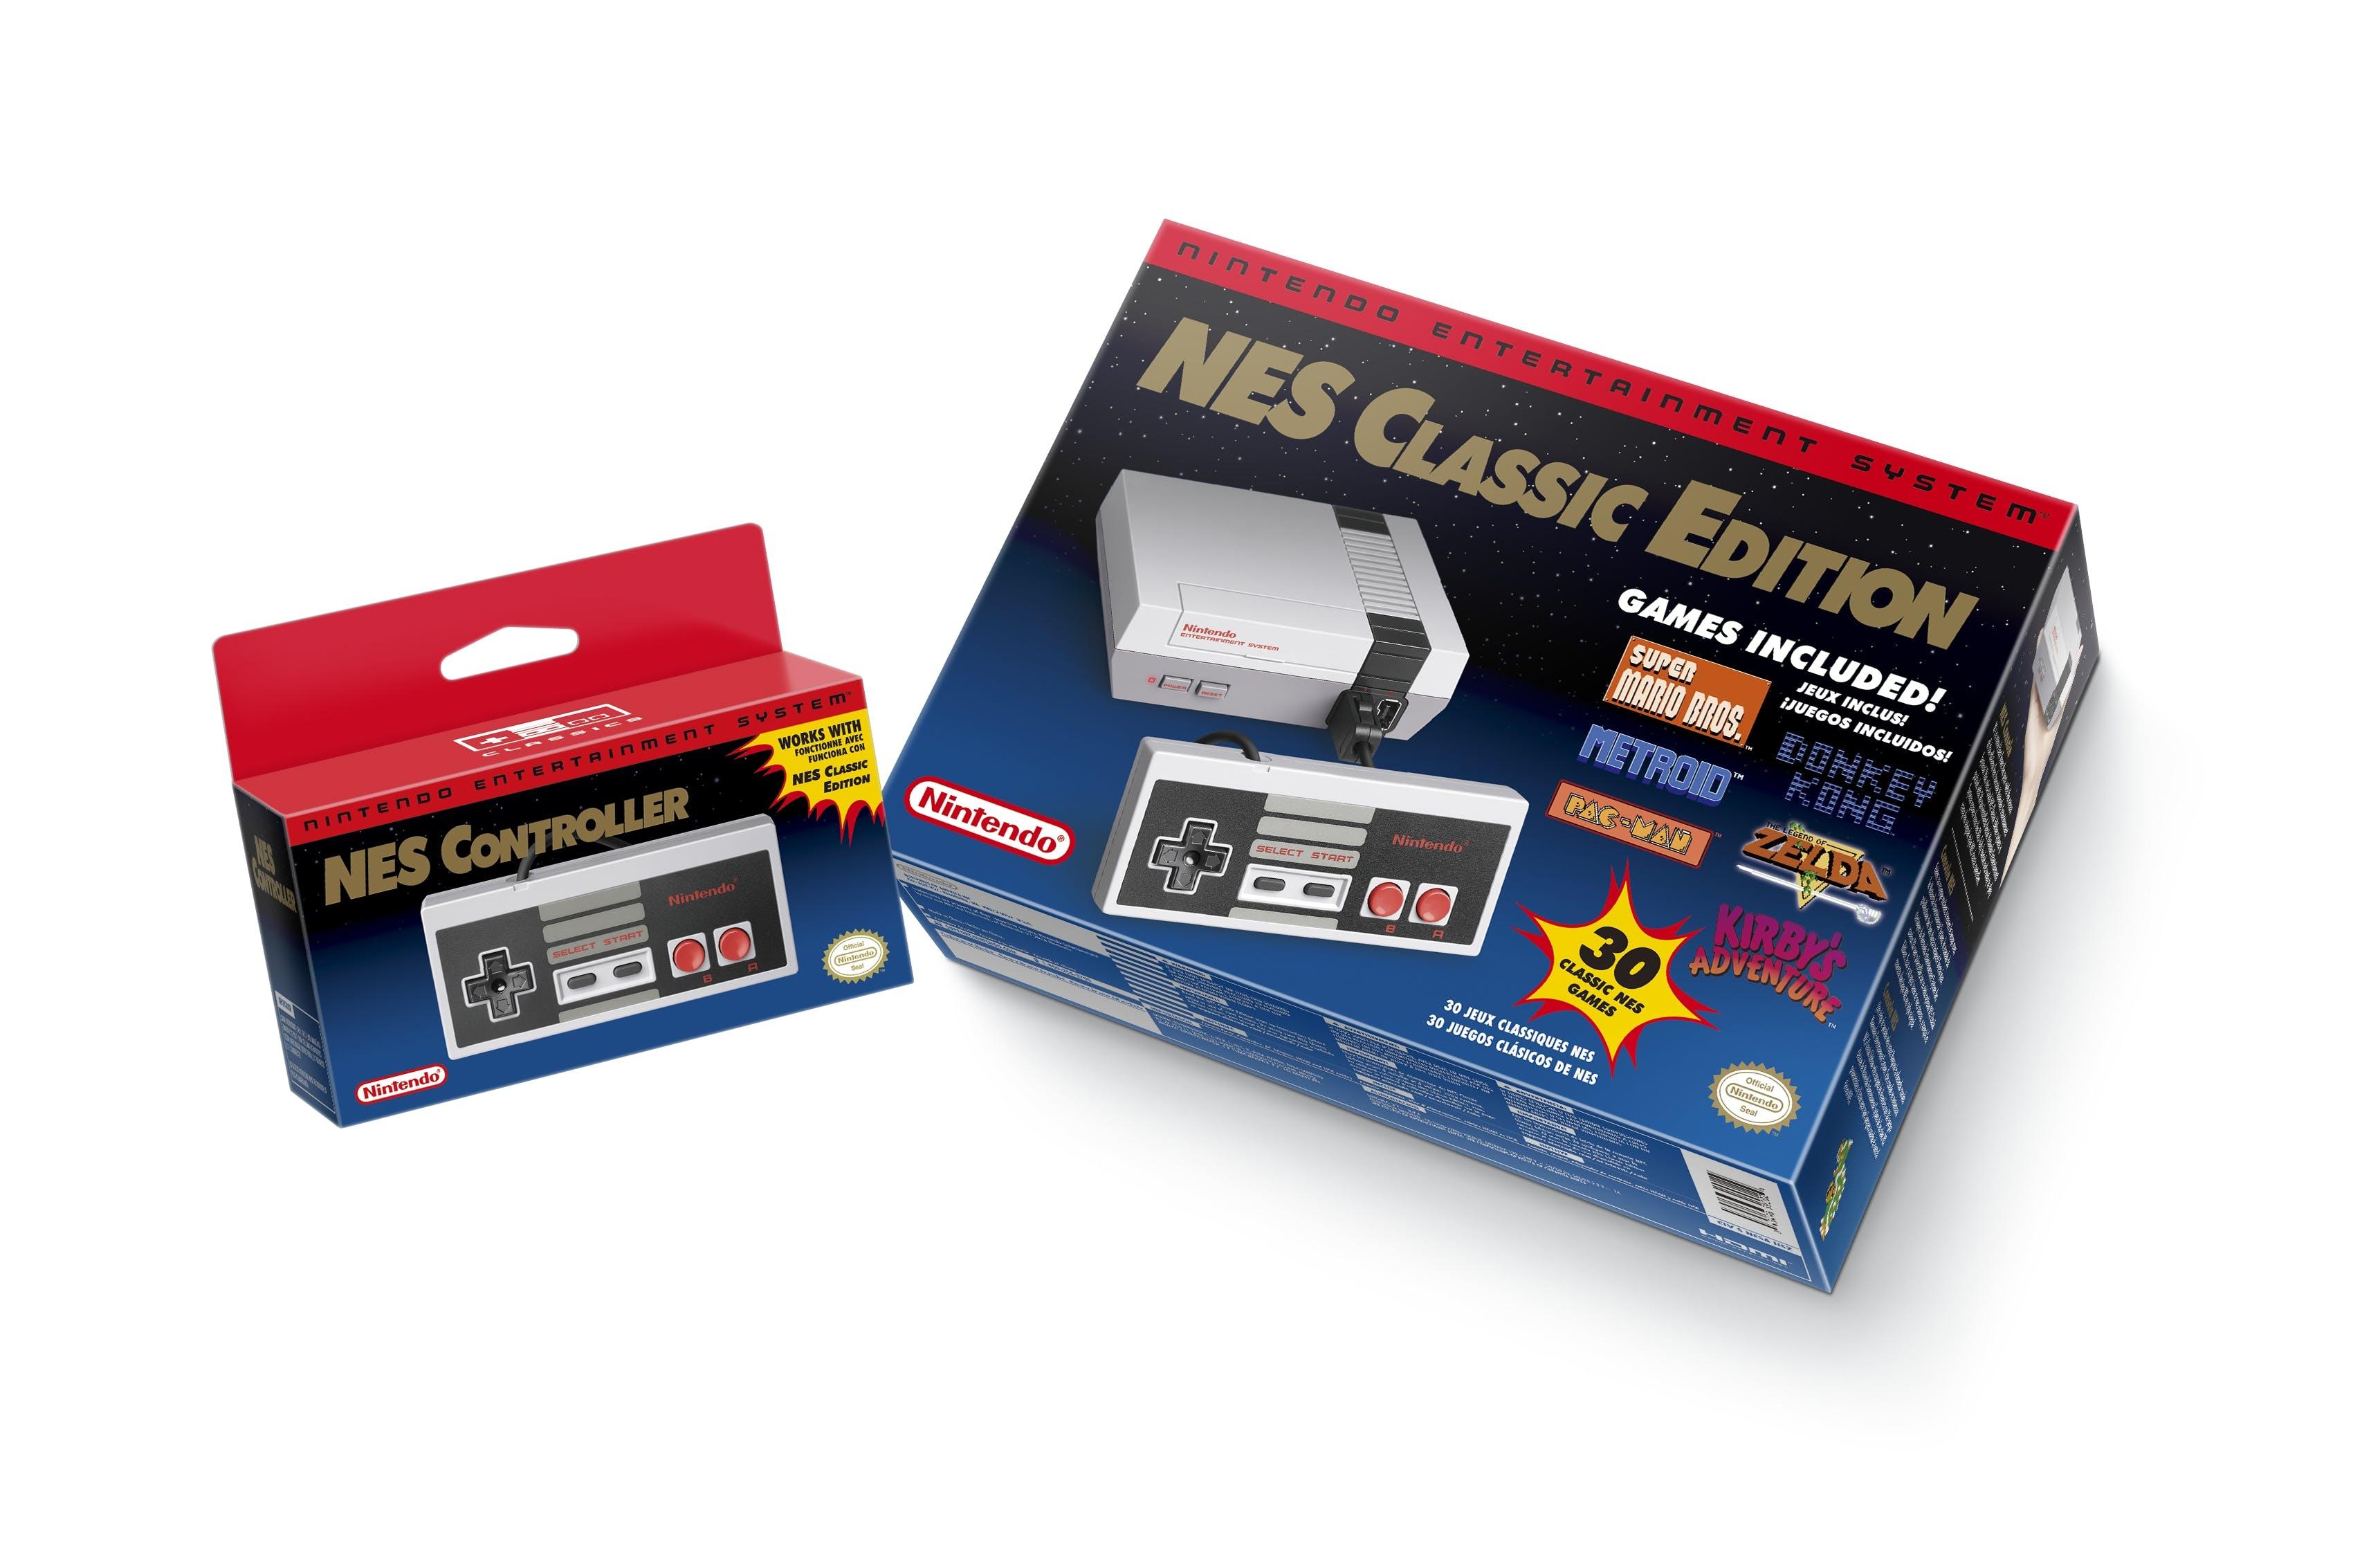 How to buy the Nintendo NES Classic